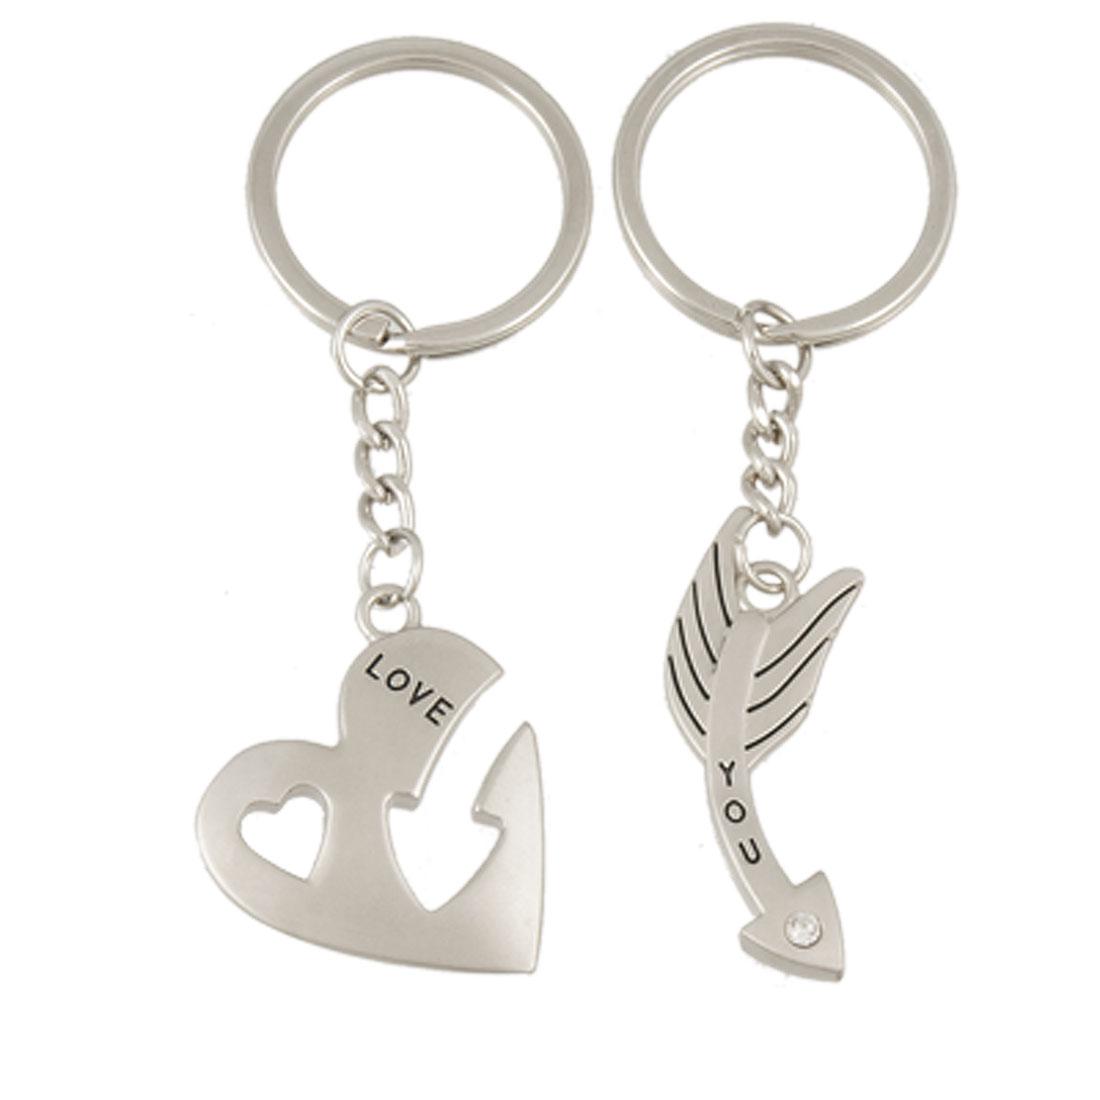 2 Pcs Heart Arrow Pendant Couple Key Chain Keychain